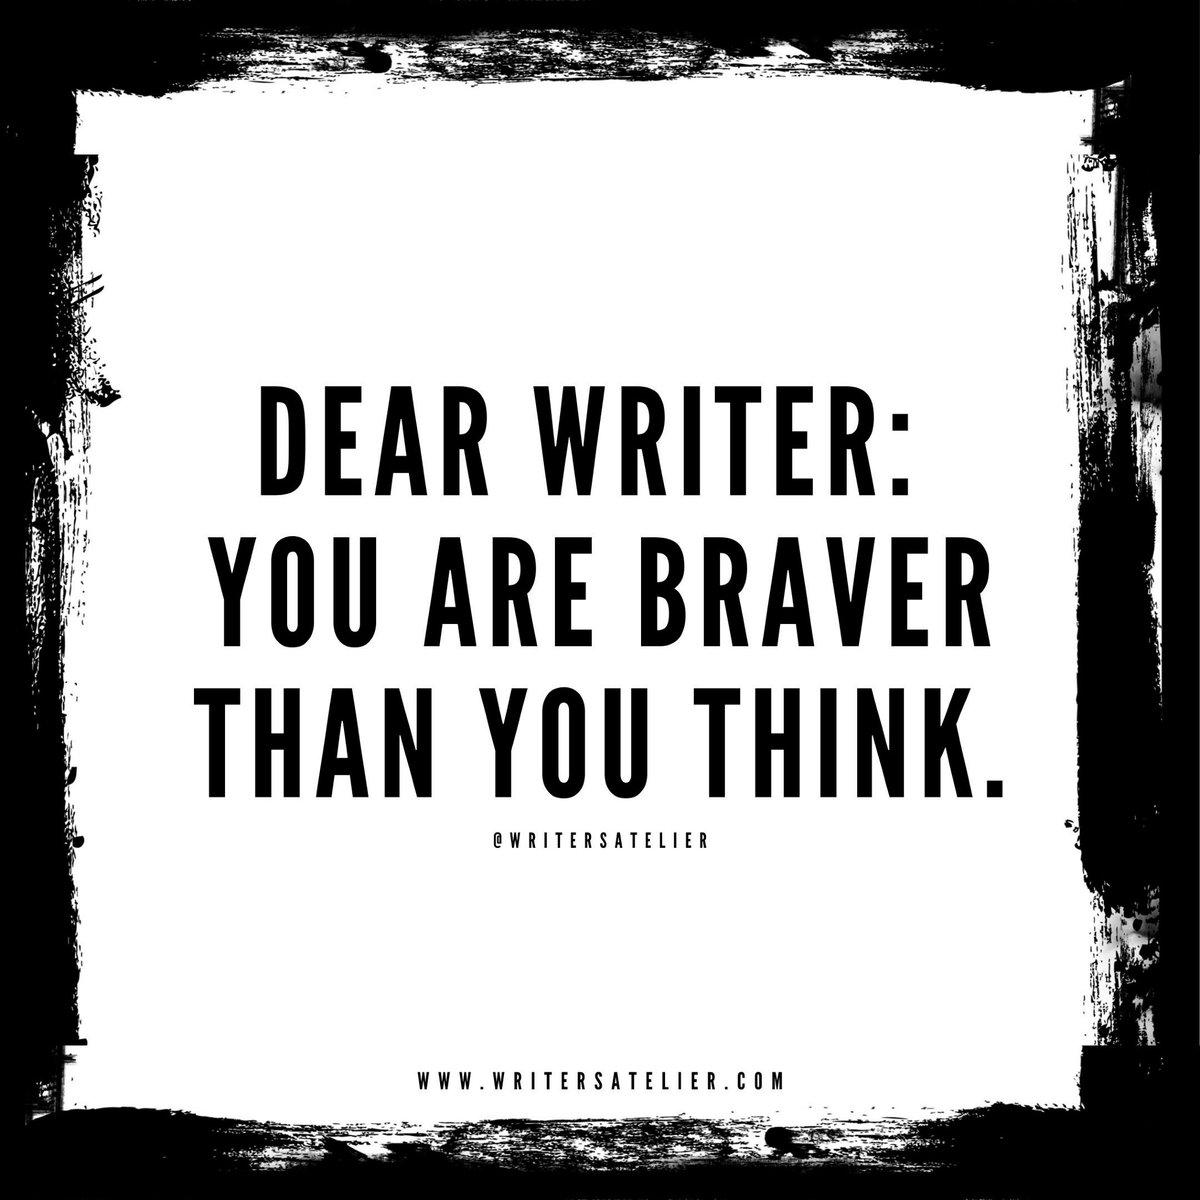 #Writer #poem #mondaythoughts #MondayMotivation #contentmarketing #podcasts #creatives #poetrylovers #checkoutmypodcast #follow #audio #goodmorning #quotes #wokewordsforthesoul